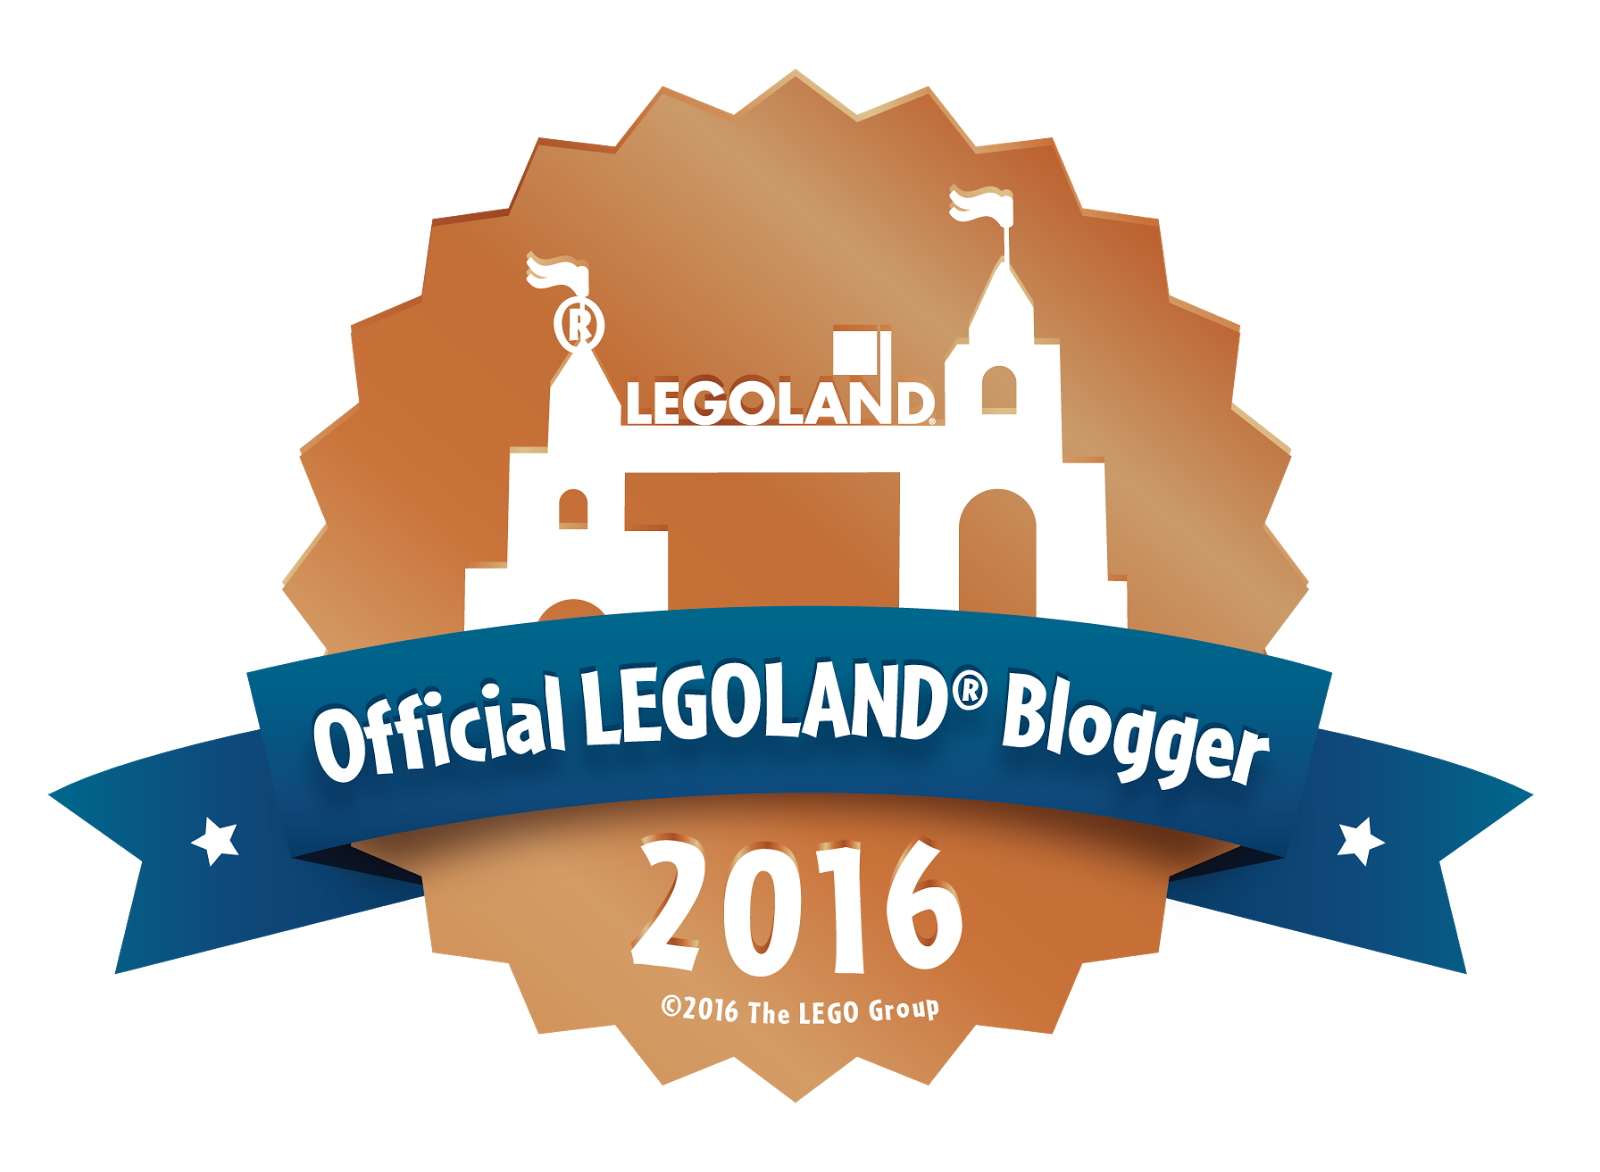 I'm a LEGOLAND Insider